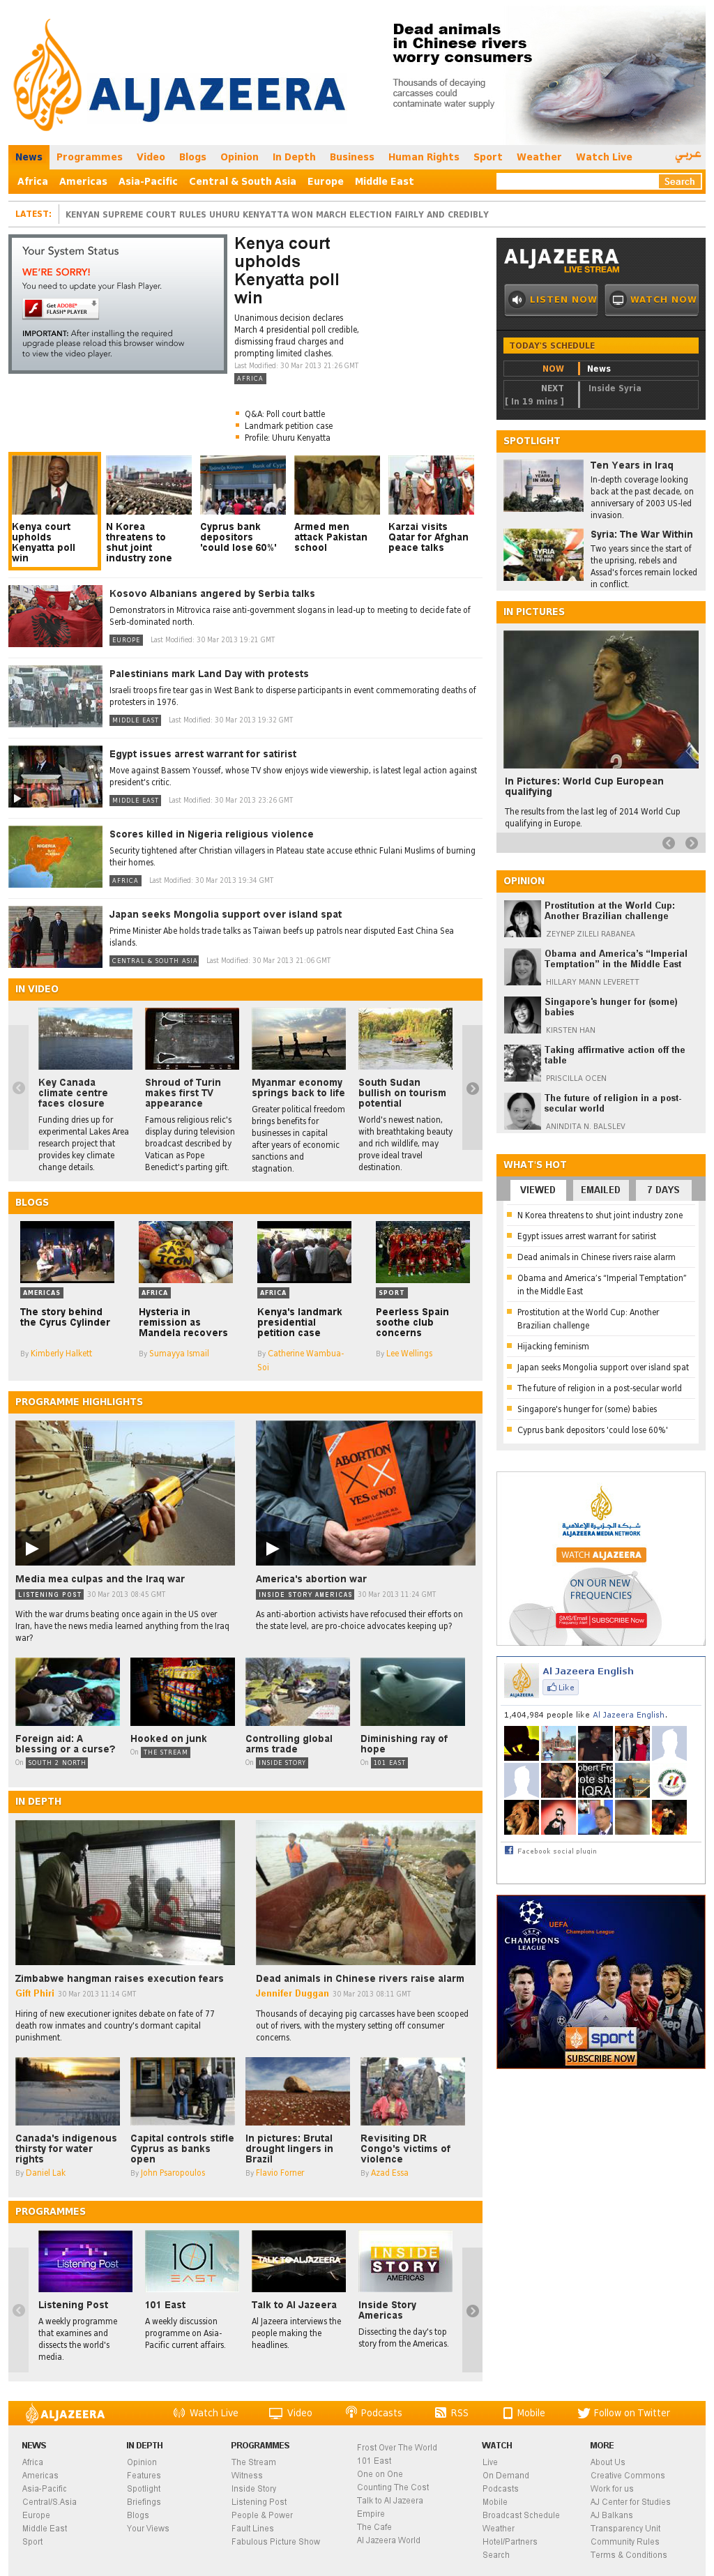 Al Jazeera (English) at Sunday March 31, 2013, 12:10 a.m. UTC